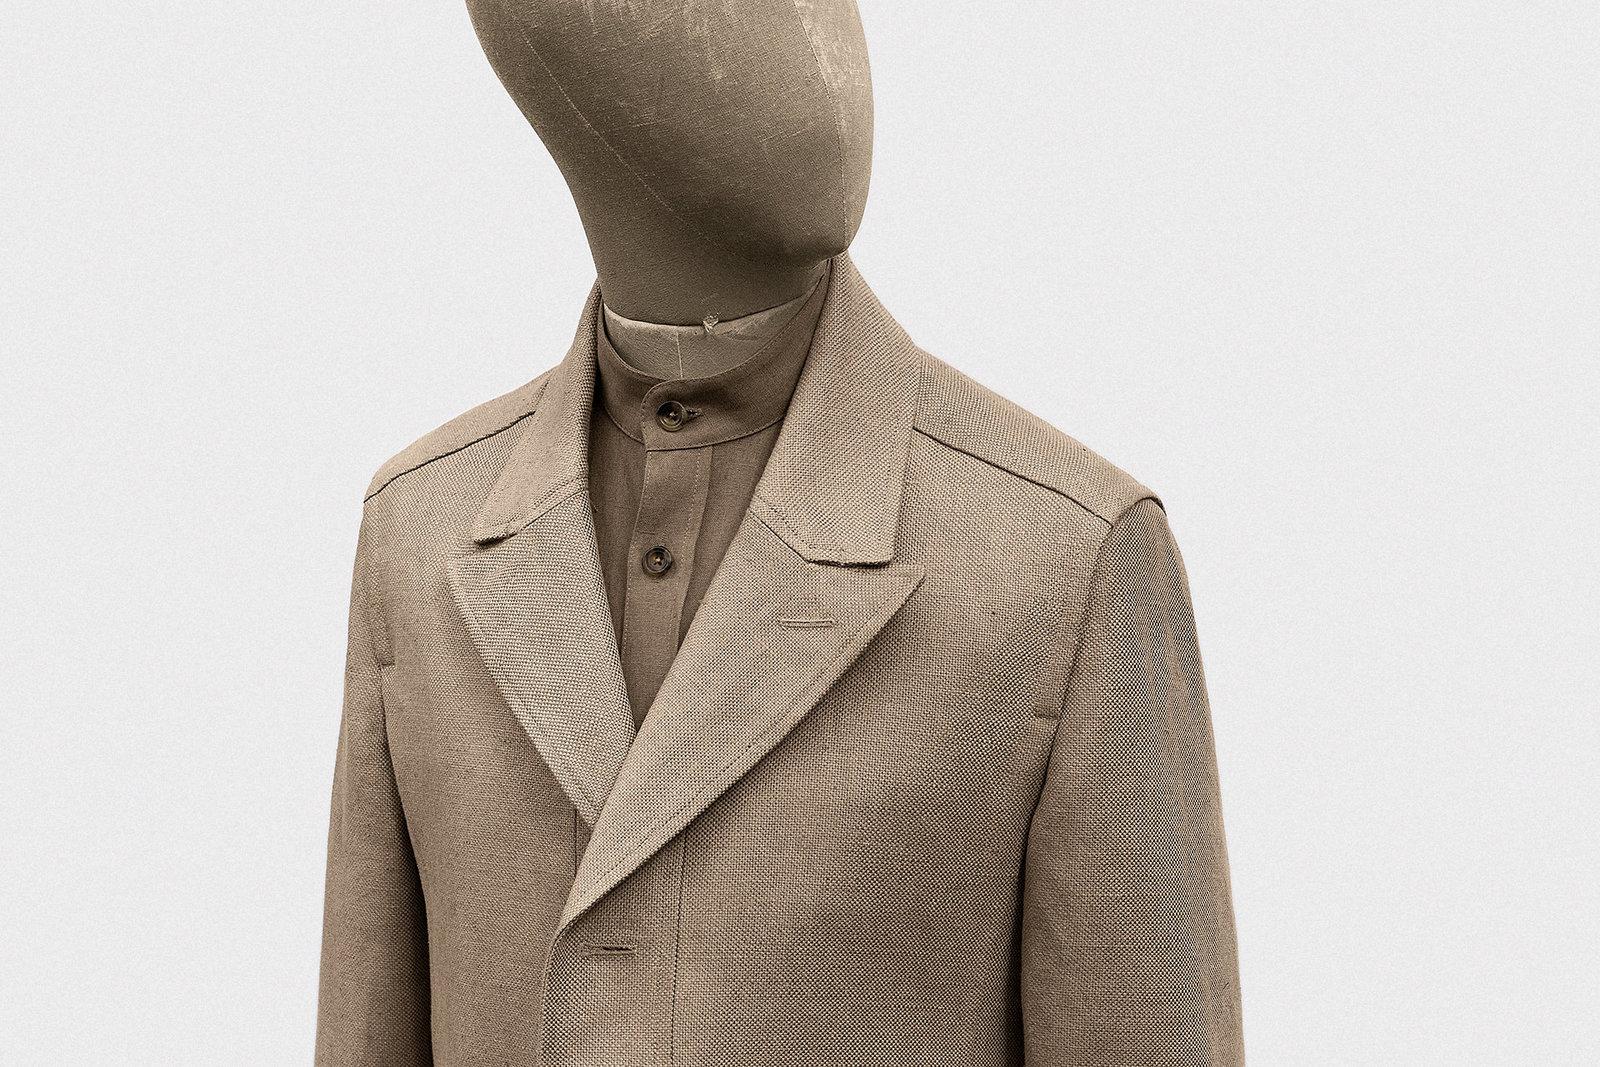 shopcoat-cotton-linen-hopsack-malt-3@2x.jpg